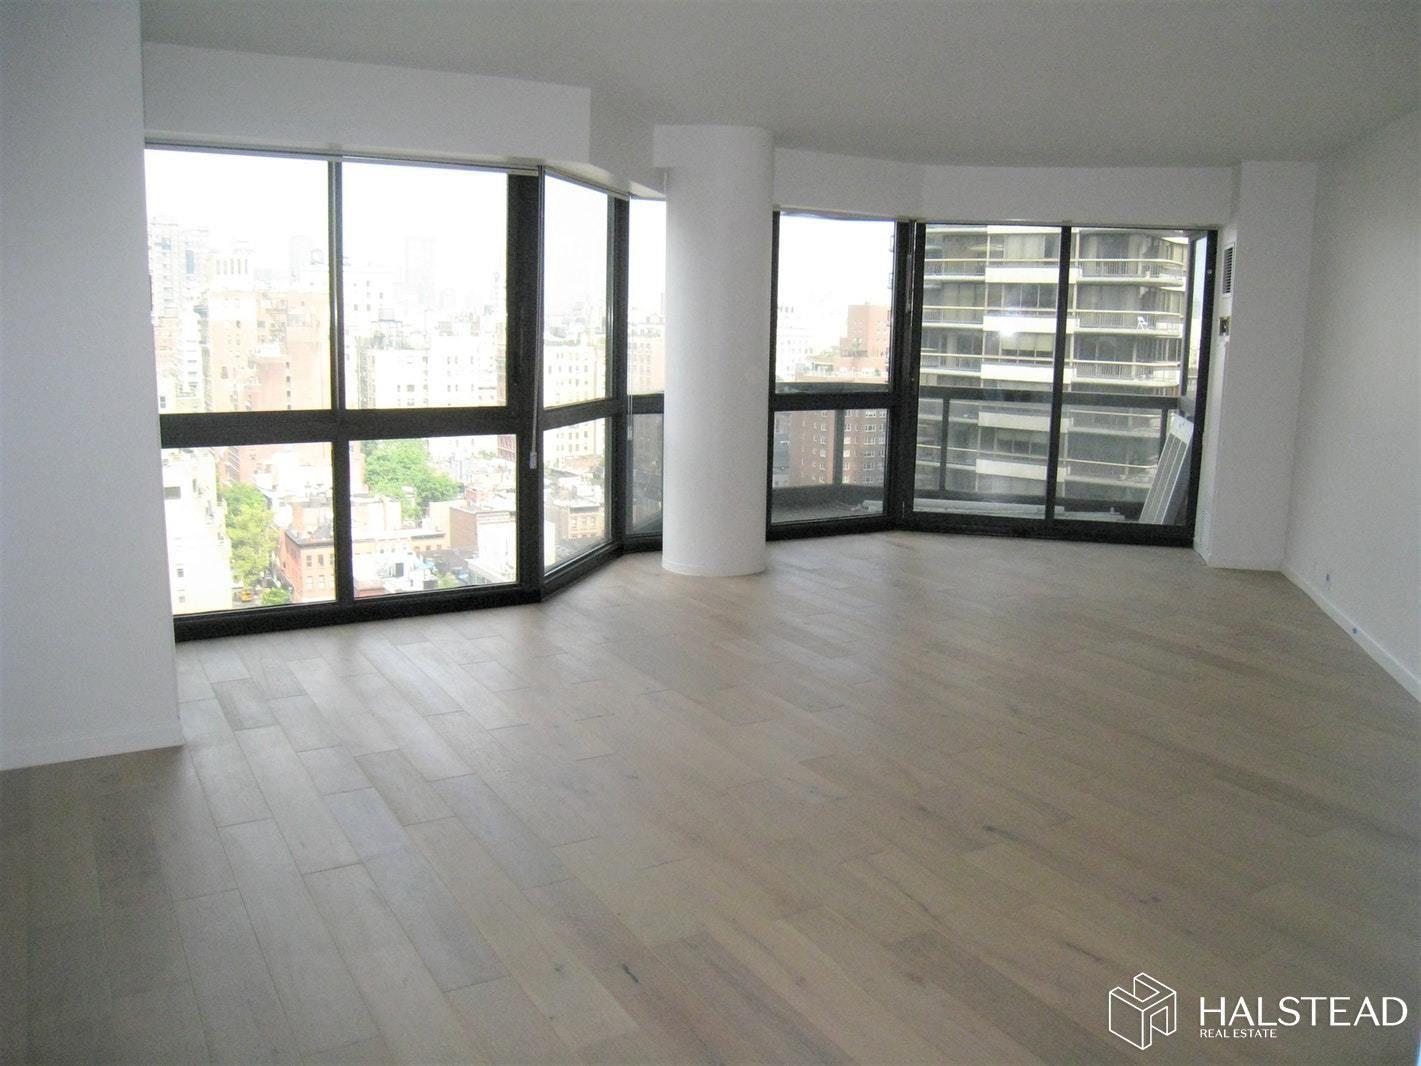 Apartment for sale at 200 East 61st Street, Apt 19DE